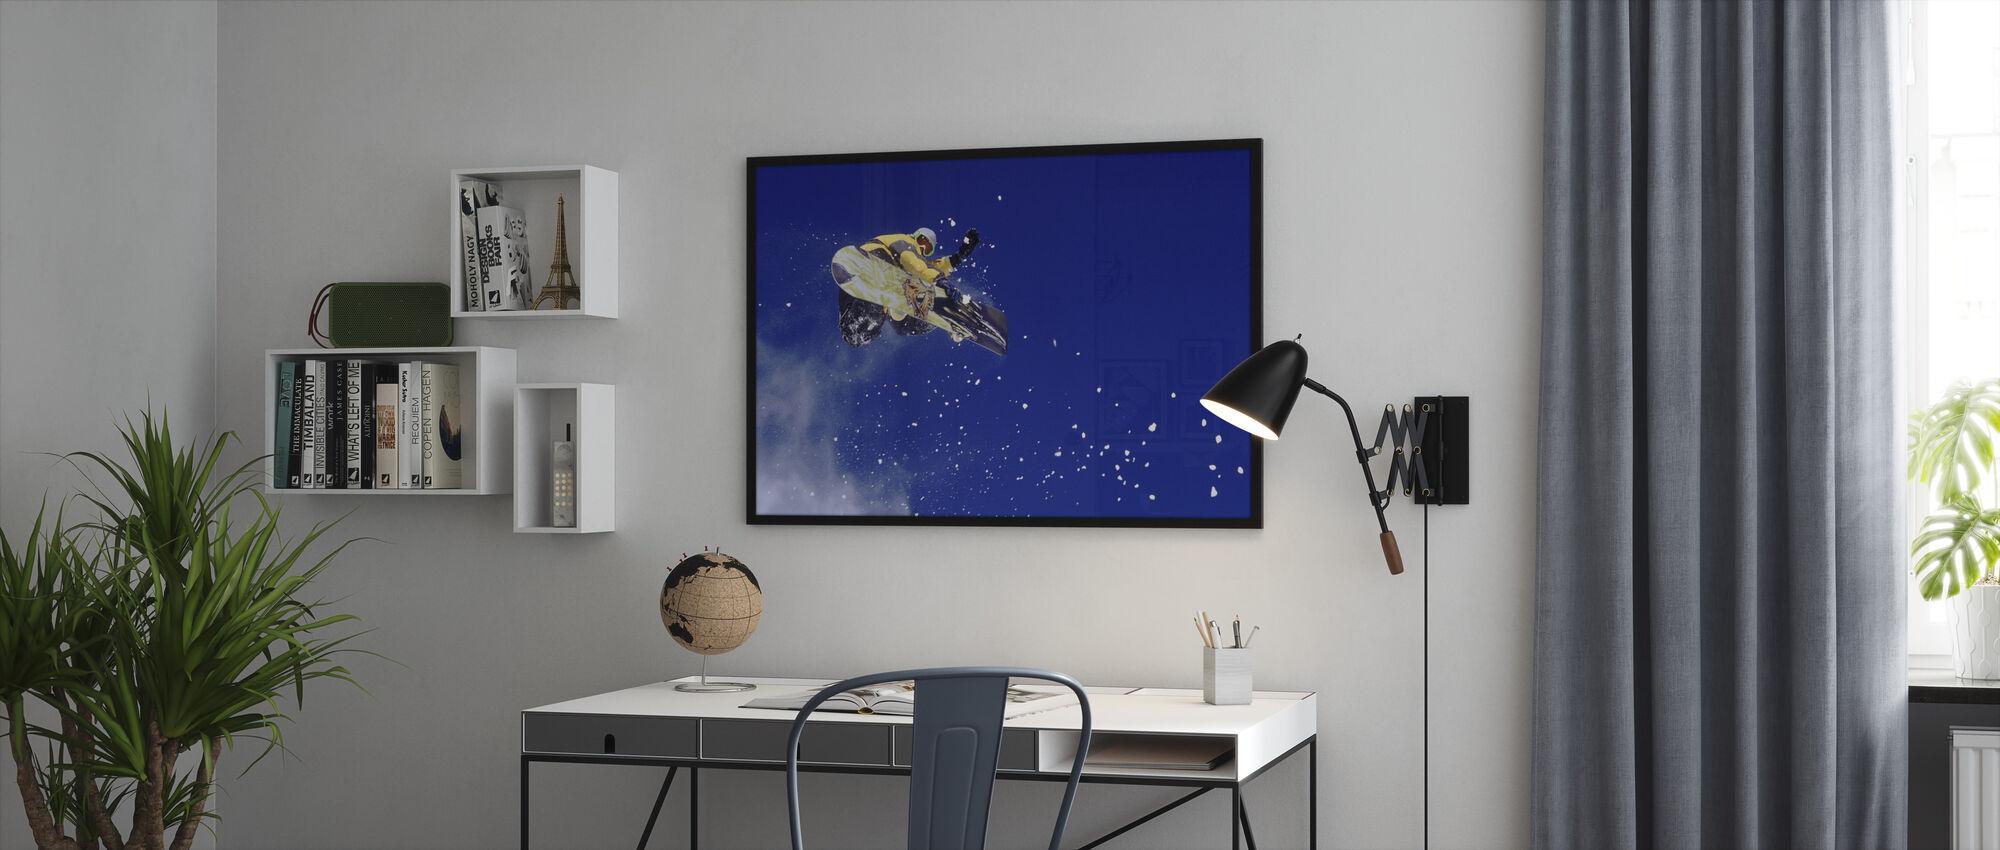 Airborne Snowboarder - Framed print - Office